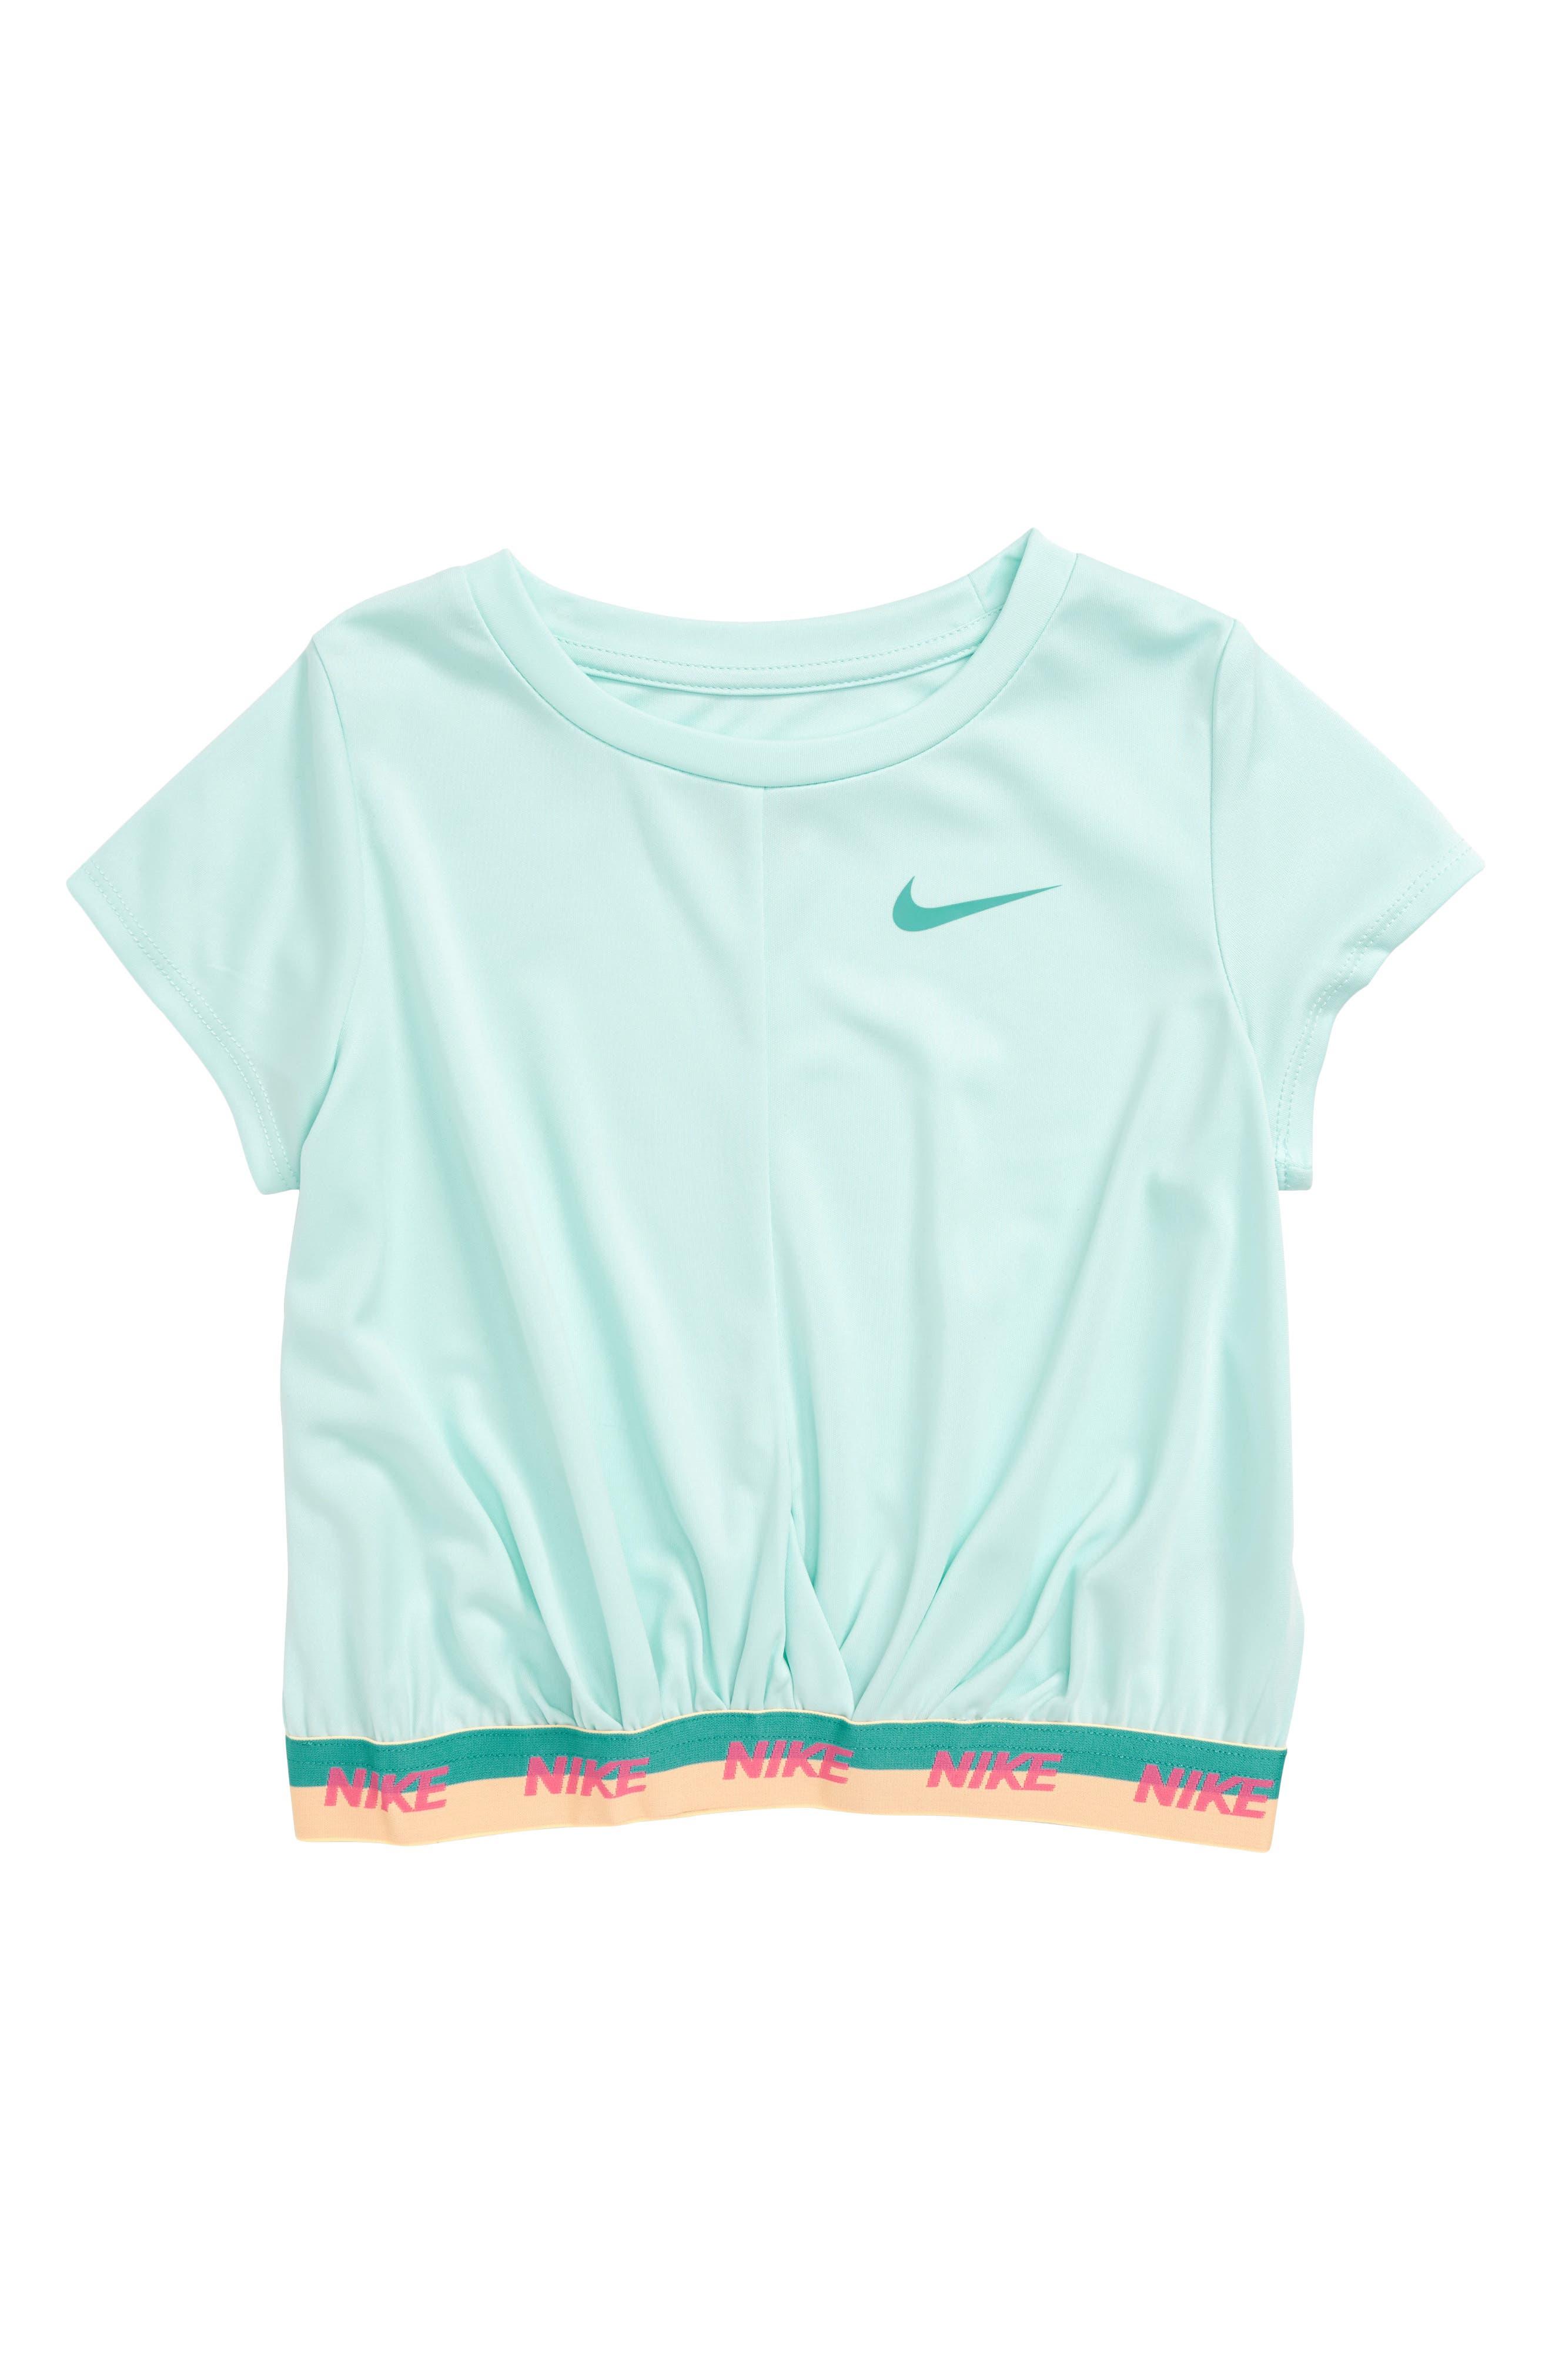 Girls Nike Dry Crop Top Size 5  Green